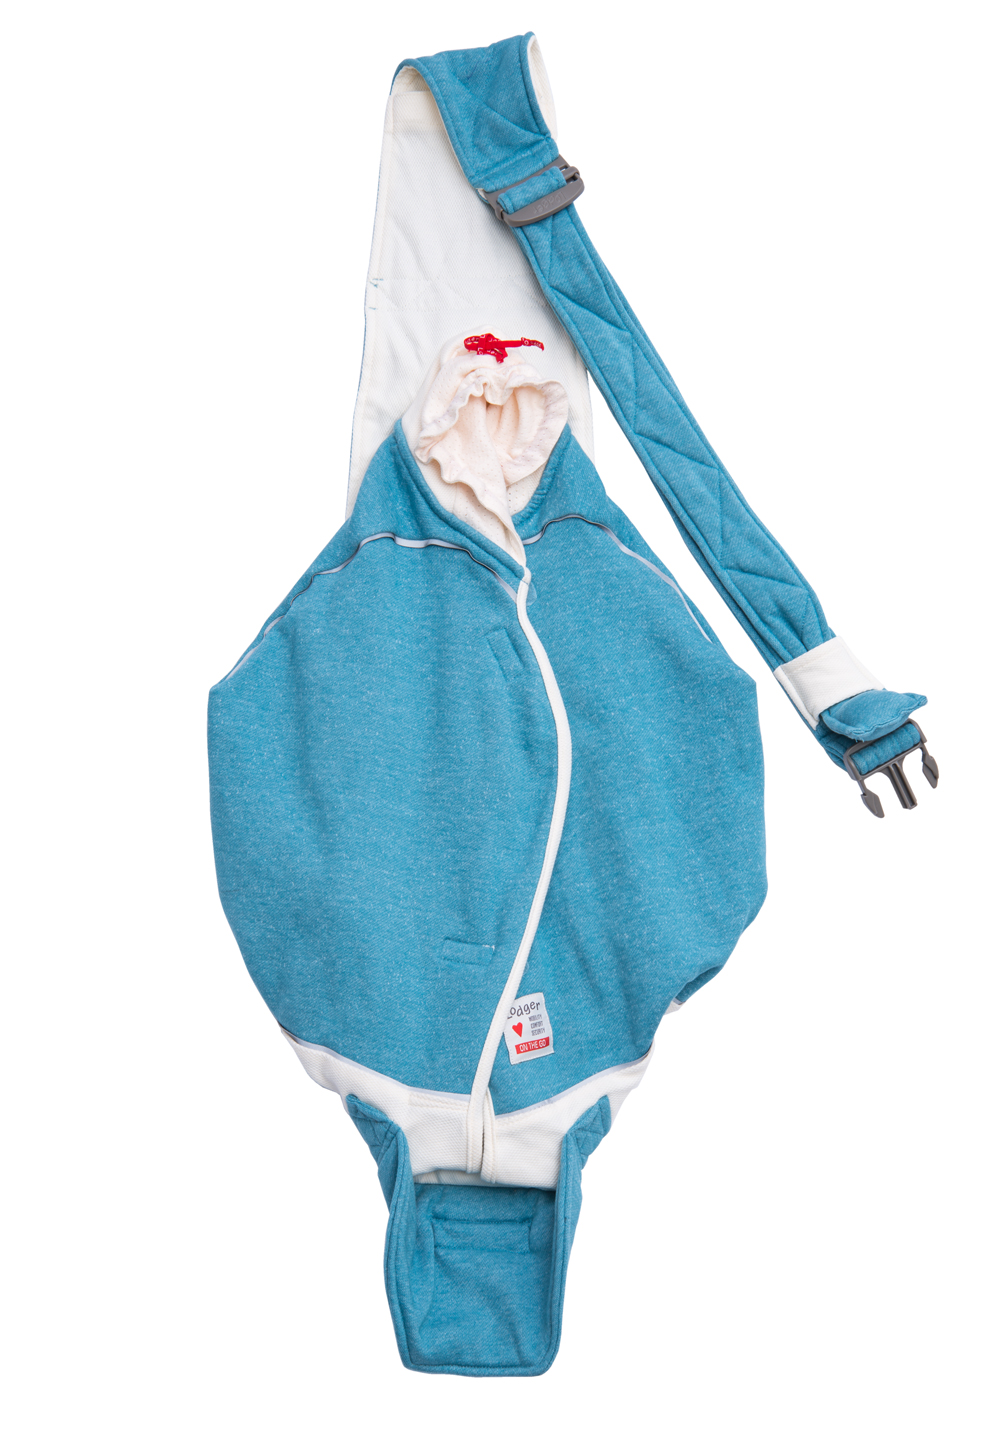 Lodger ShelterSport multifunkcion ls slings, Silvercreek SH 045 bērnu ietinamā sedziņa